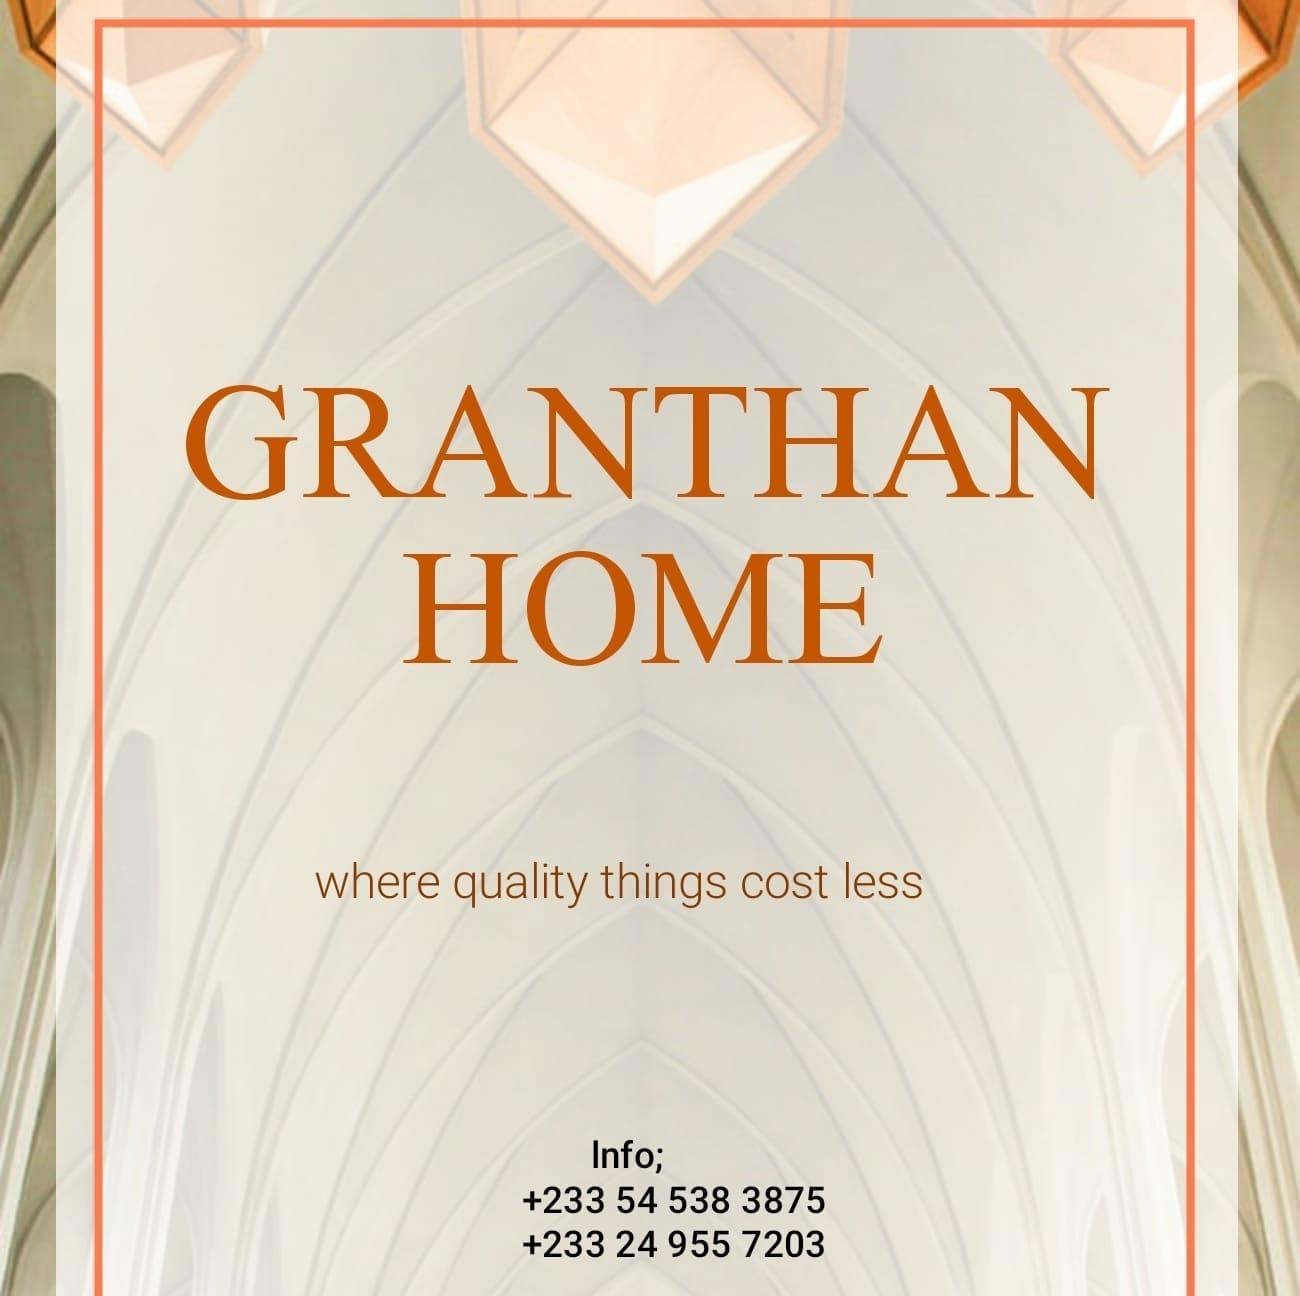 Granthan Home Enterprise